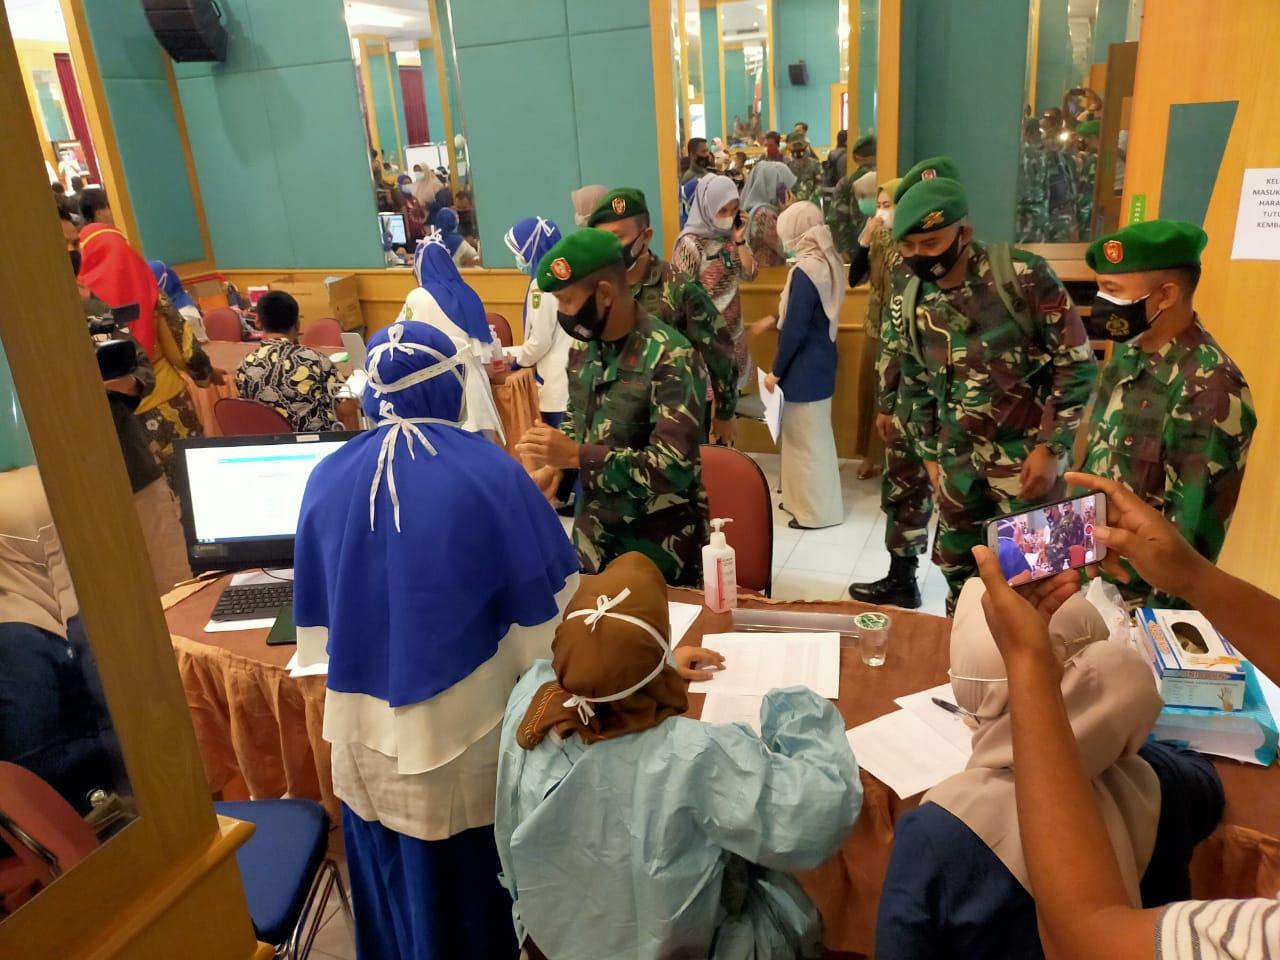 Dinkes Riau Gelar Vaksin Tahap II di RSUD Arifin Achmad</a>